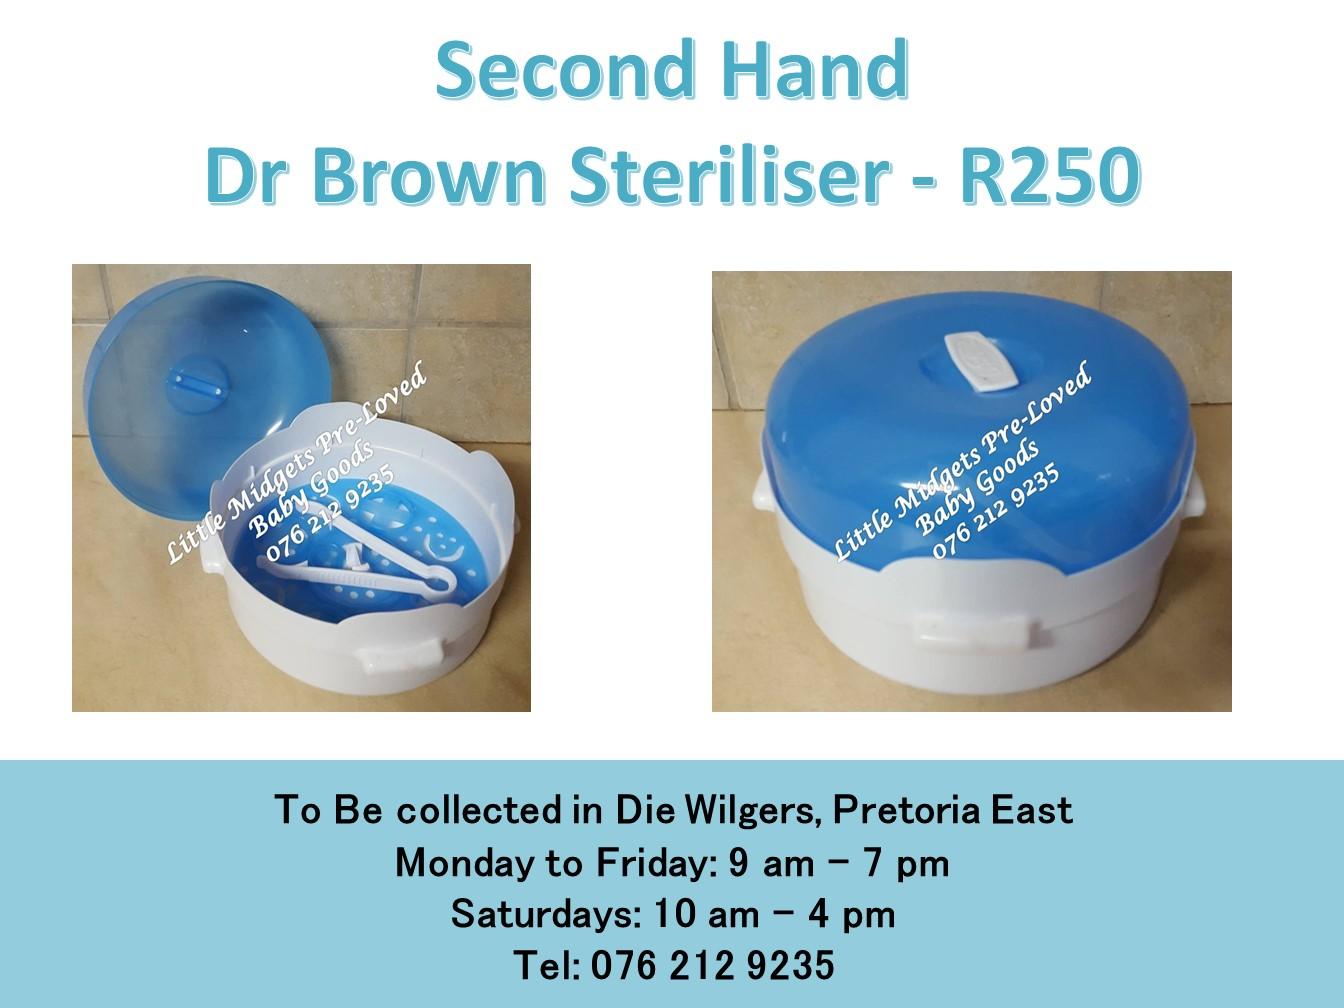 Second Hand Dr Brown Steriliser